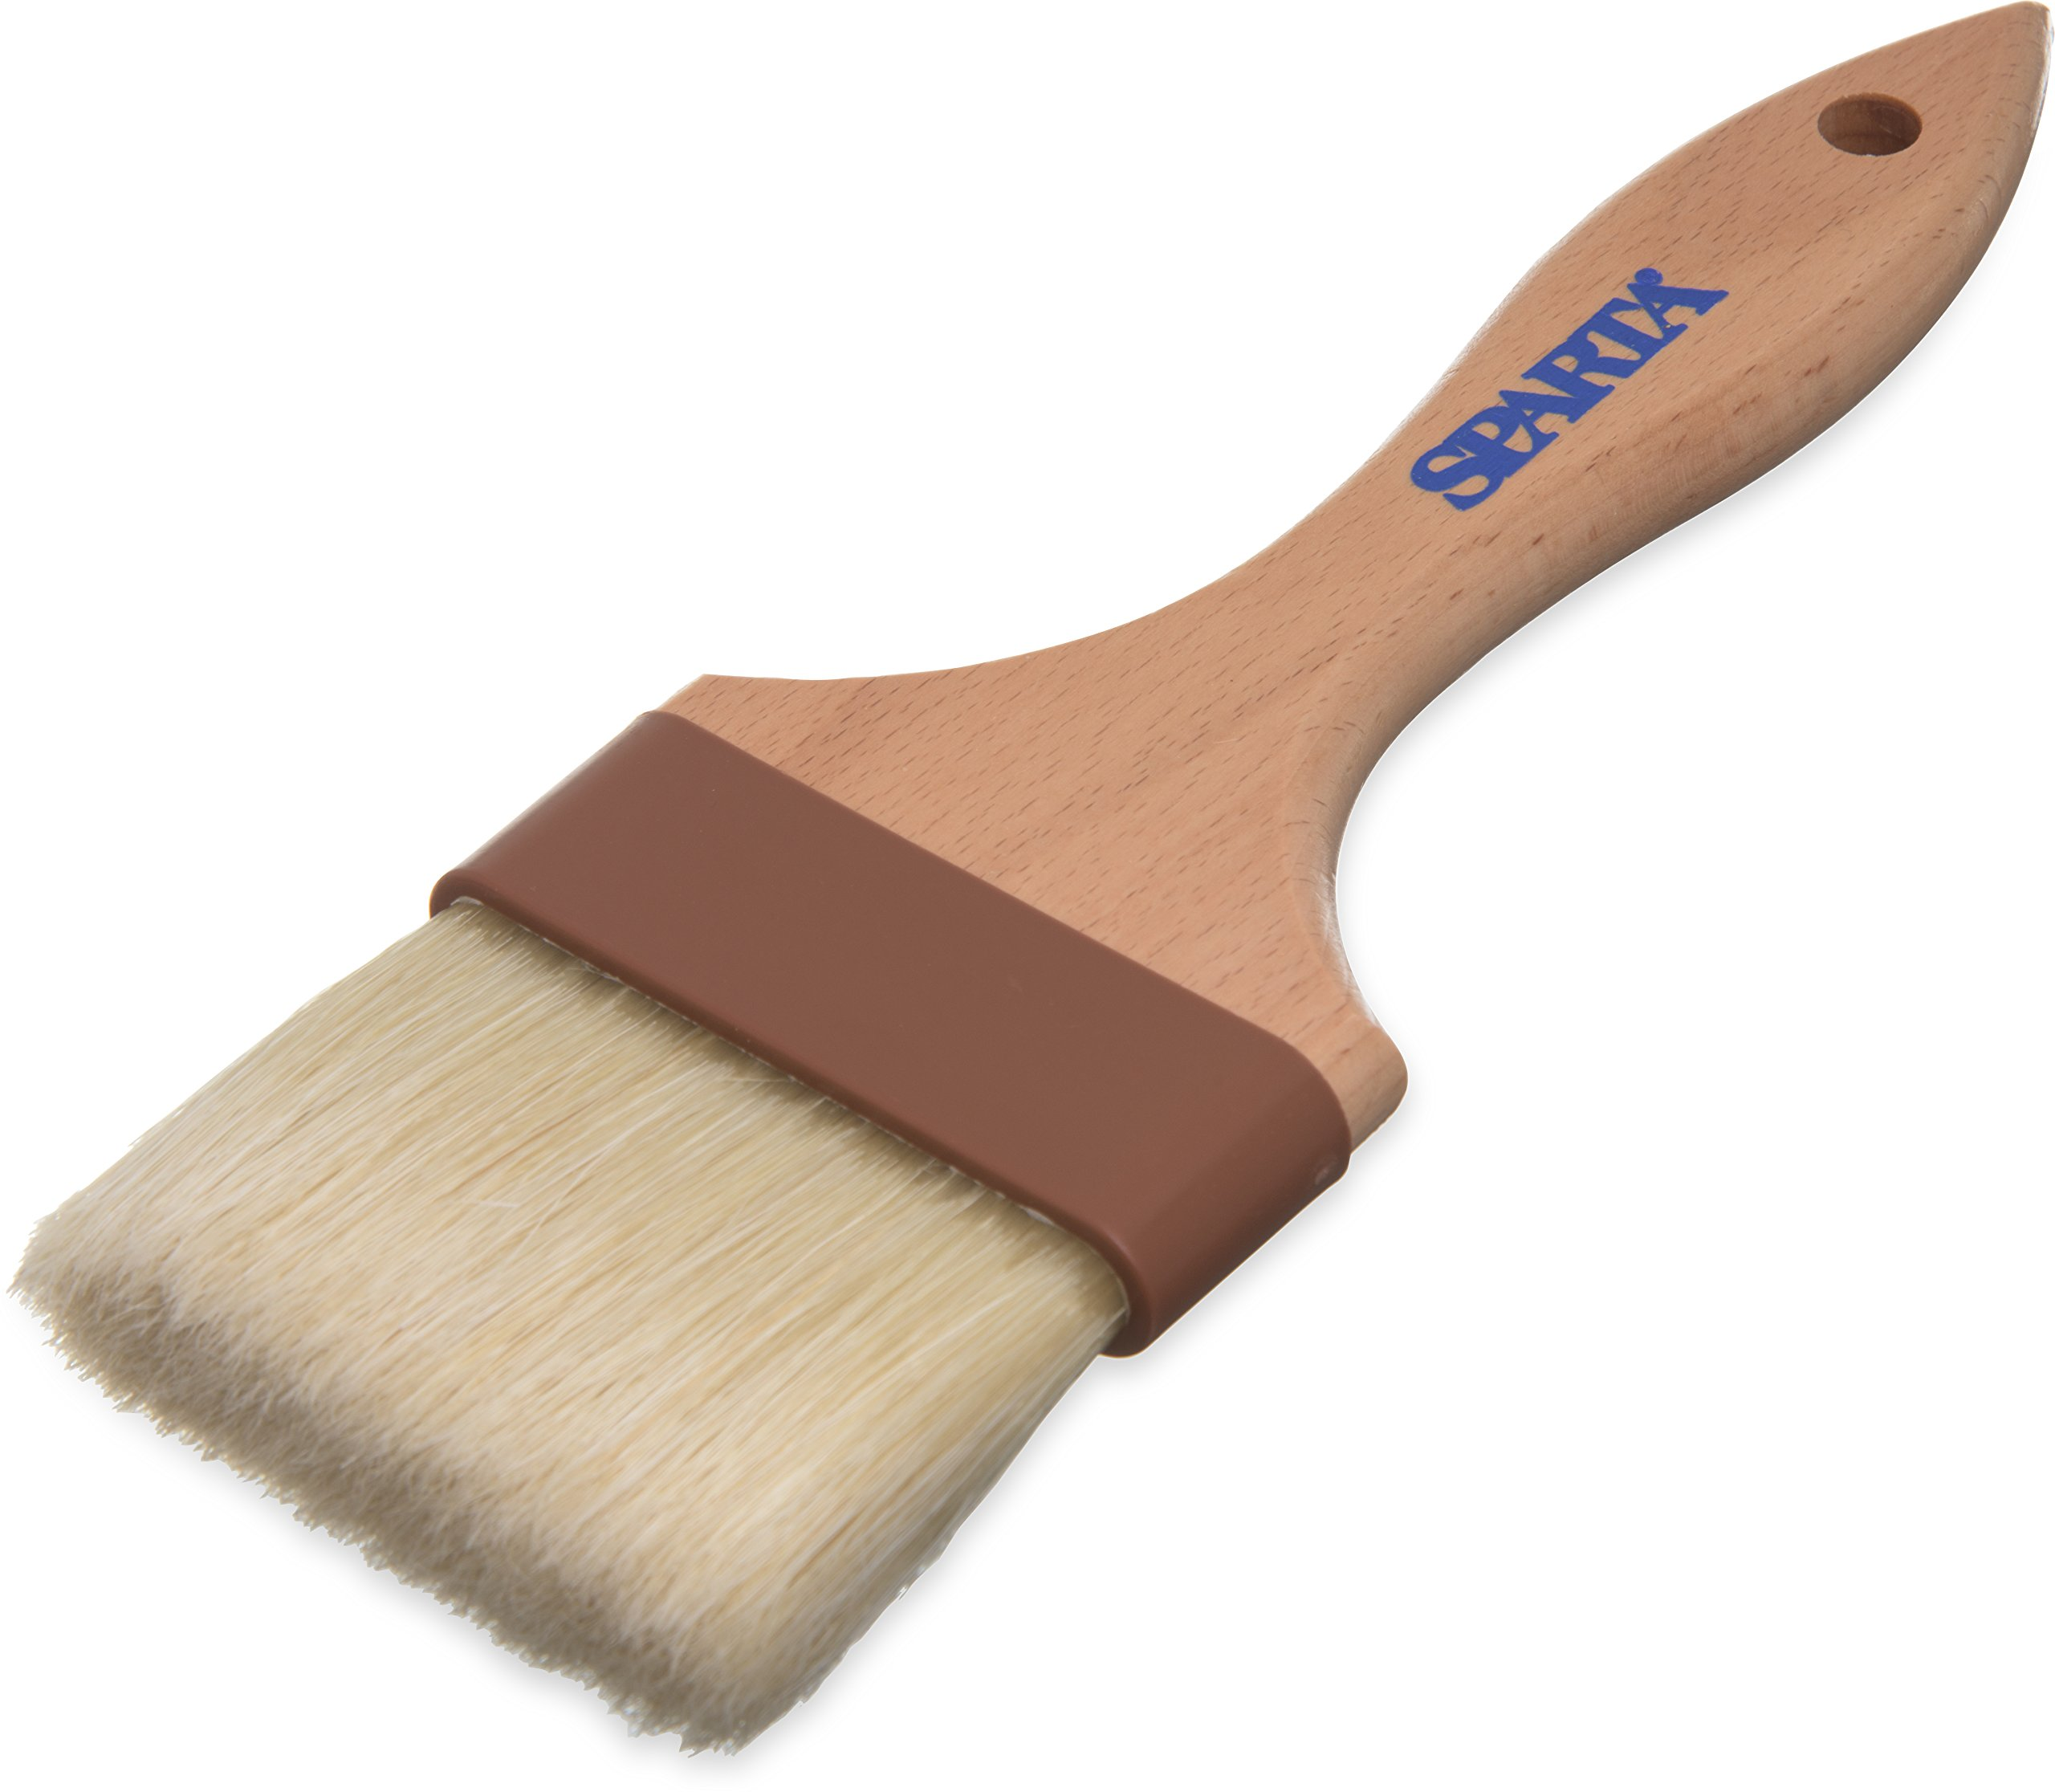 Carlisle 4037500 Sparta Wide Flat Basting Brush with Boars Bristles, 3'' by Carlisle